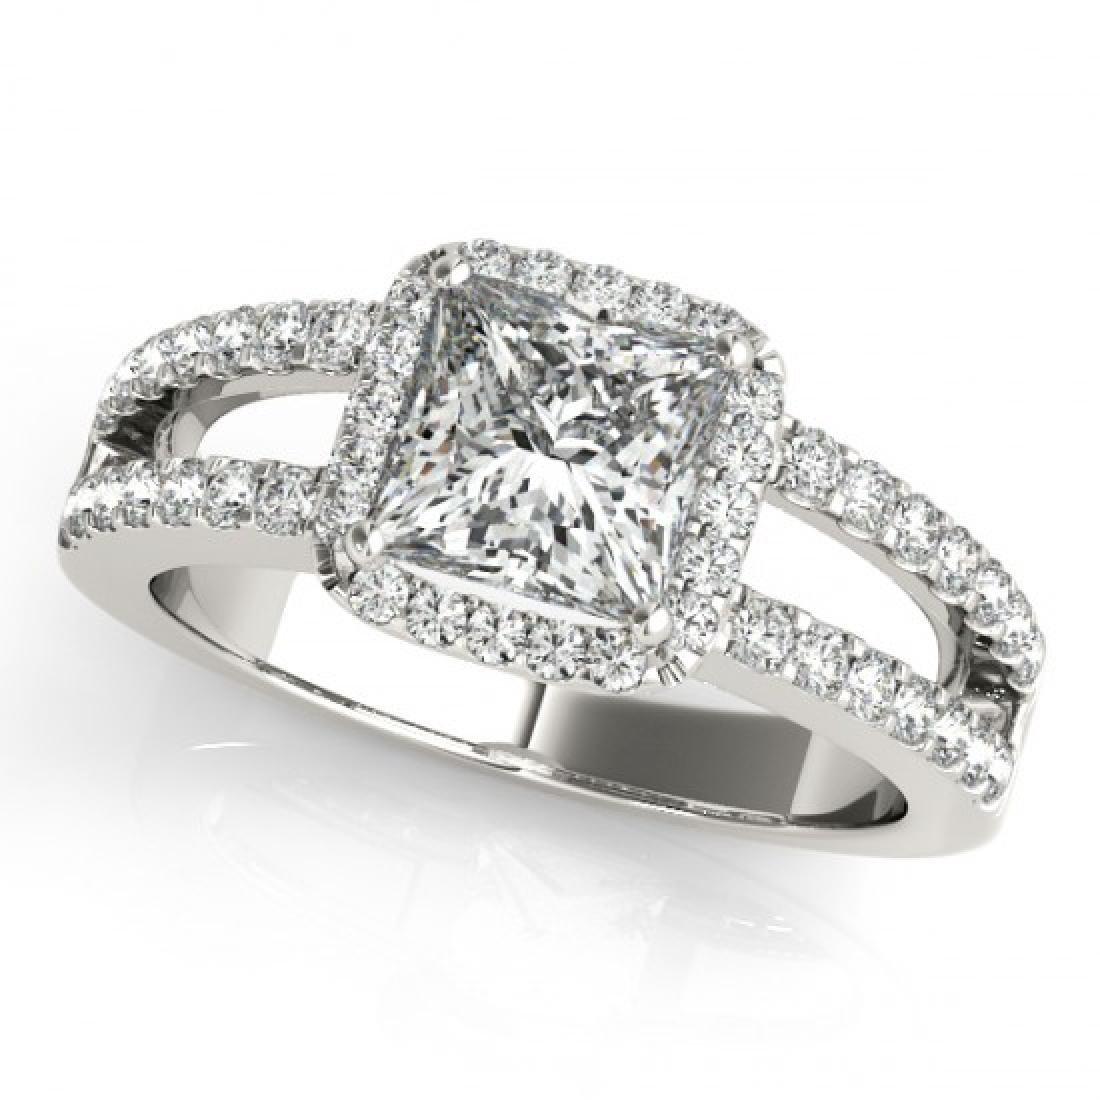 1.26 CTW Certified VS/SI Princess Diamond Solitaire